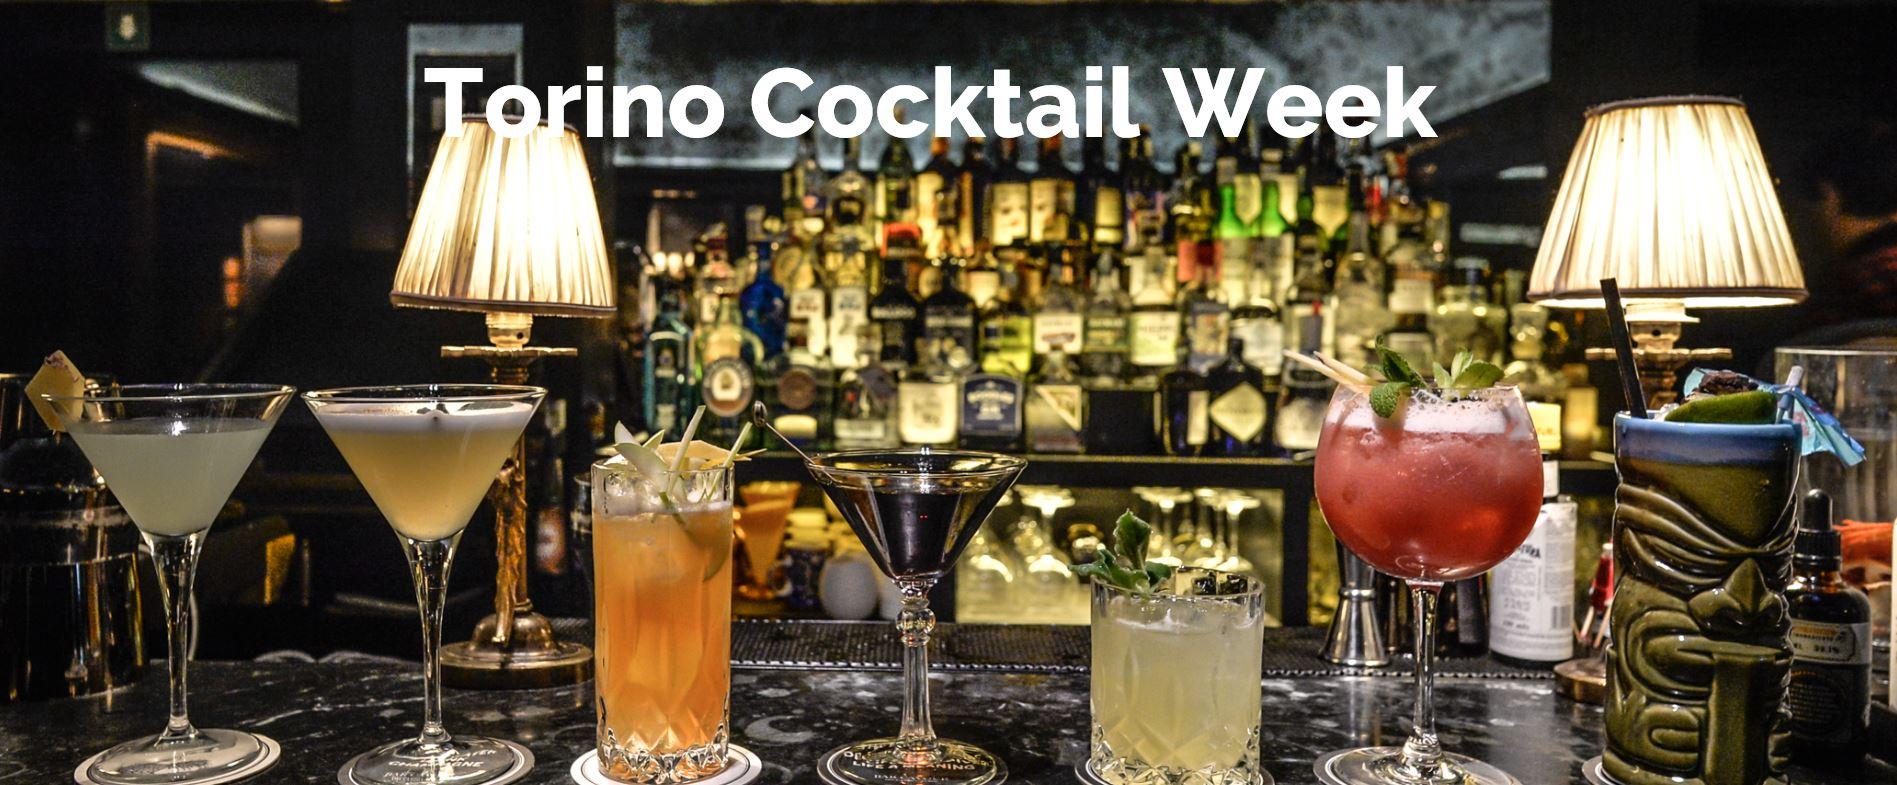 Torino Cocktail Week: 19-25 marzo